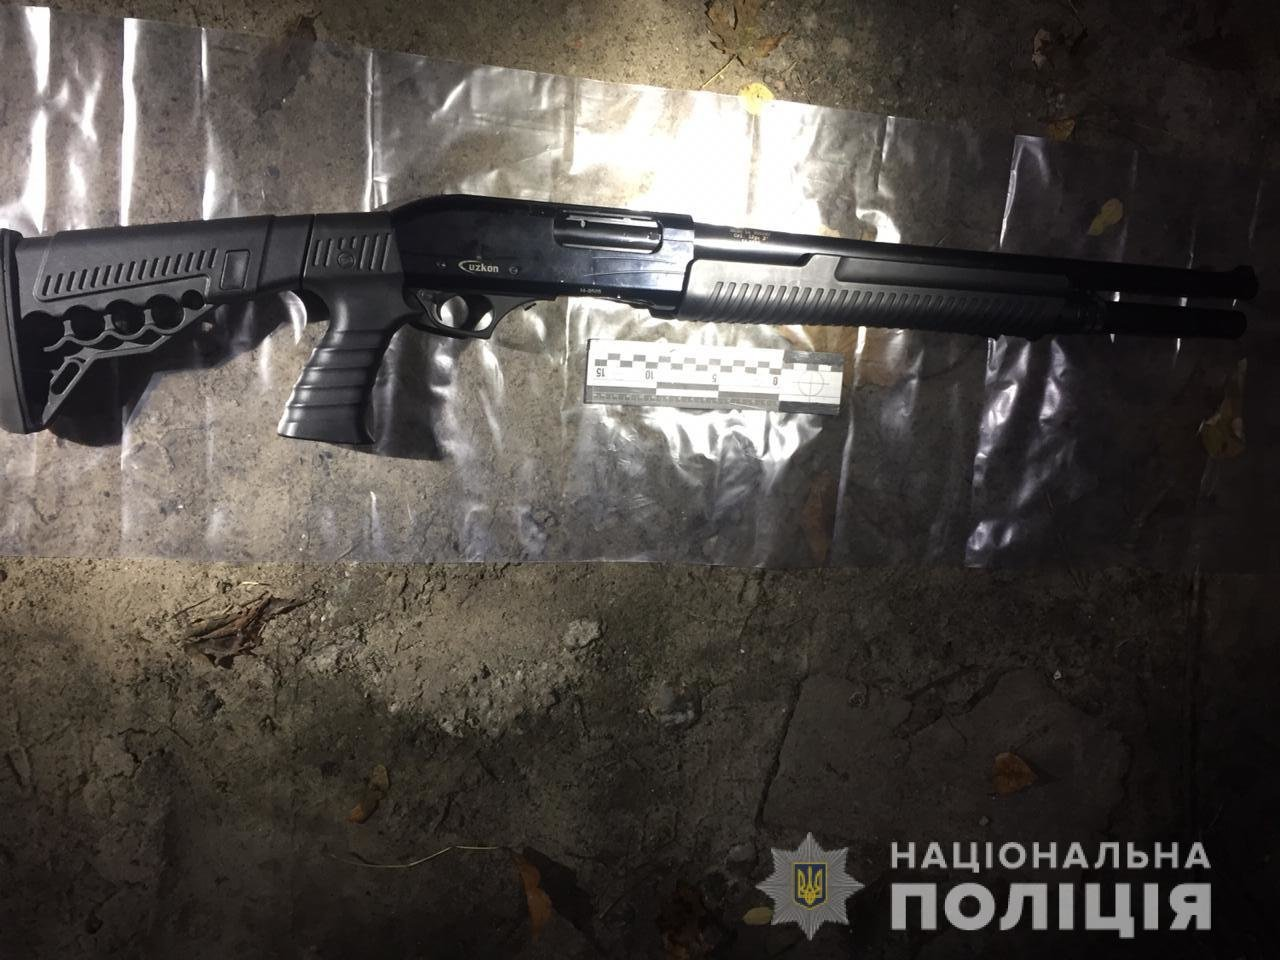 Убийство на Набережной в Днепре: все подробности, - ФОТО, фото-5